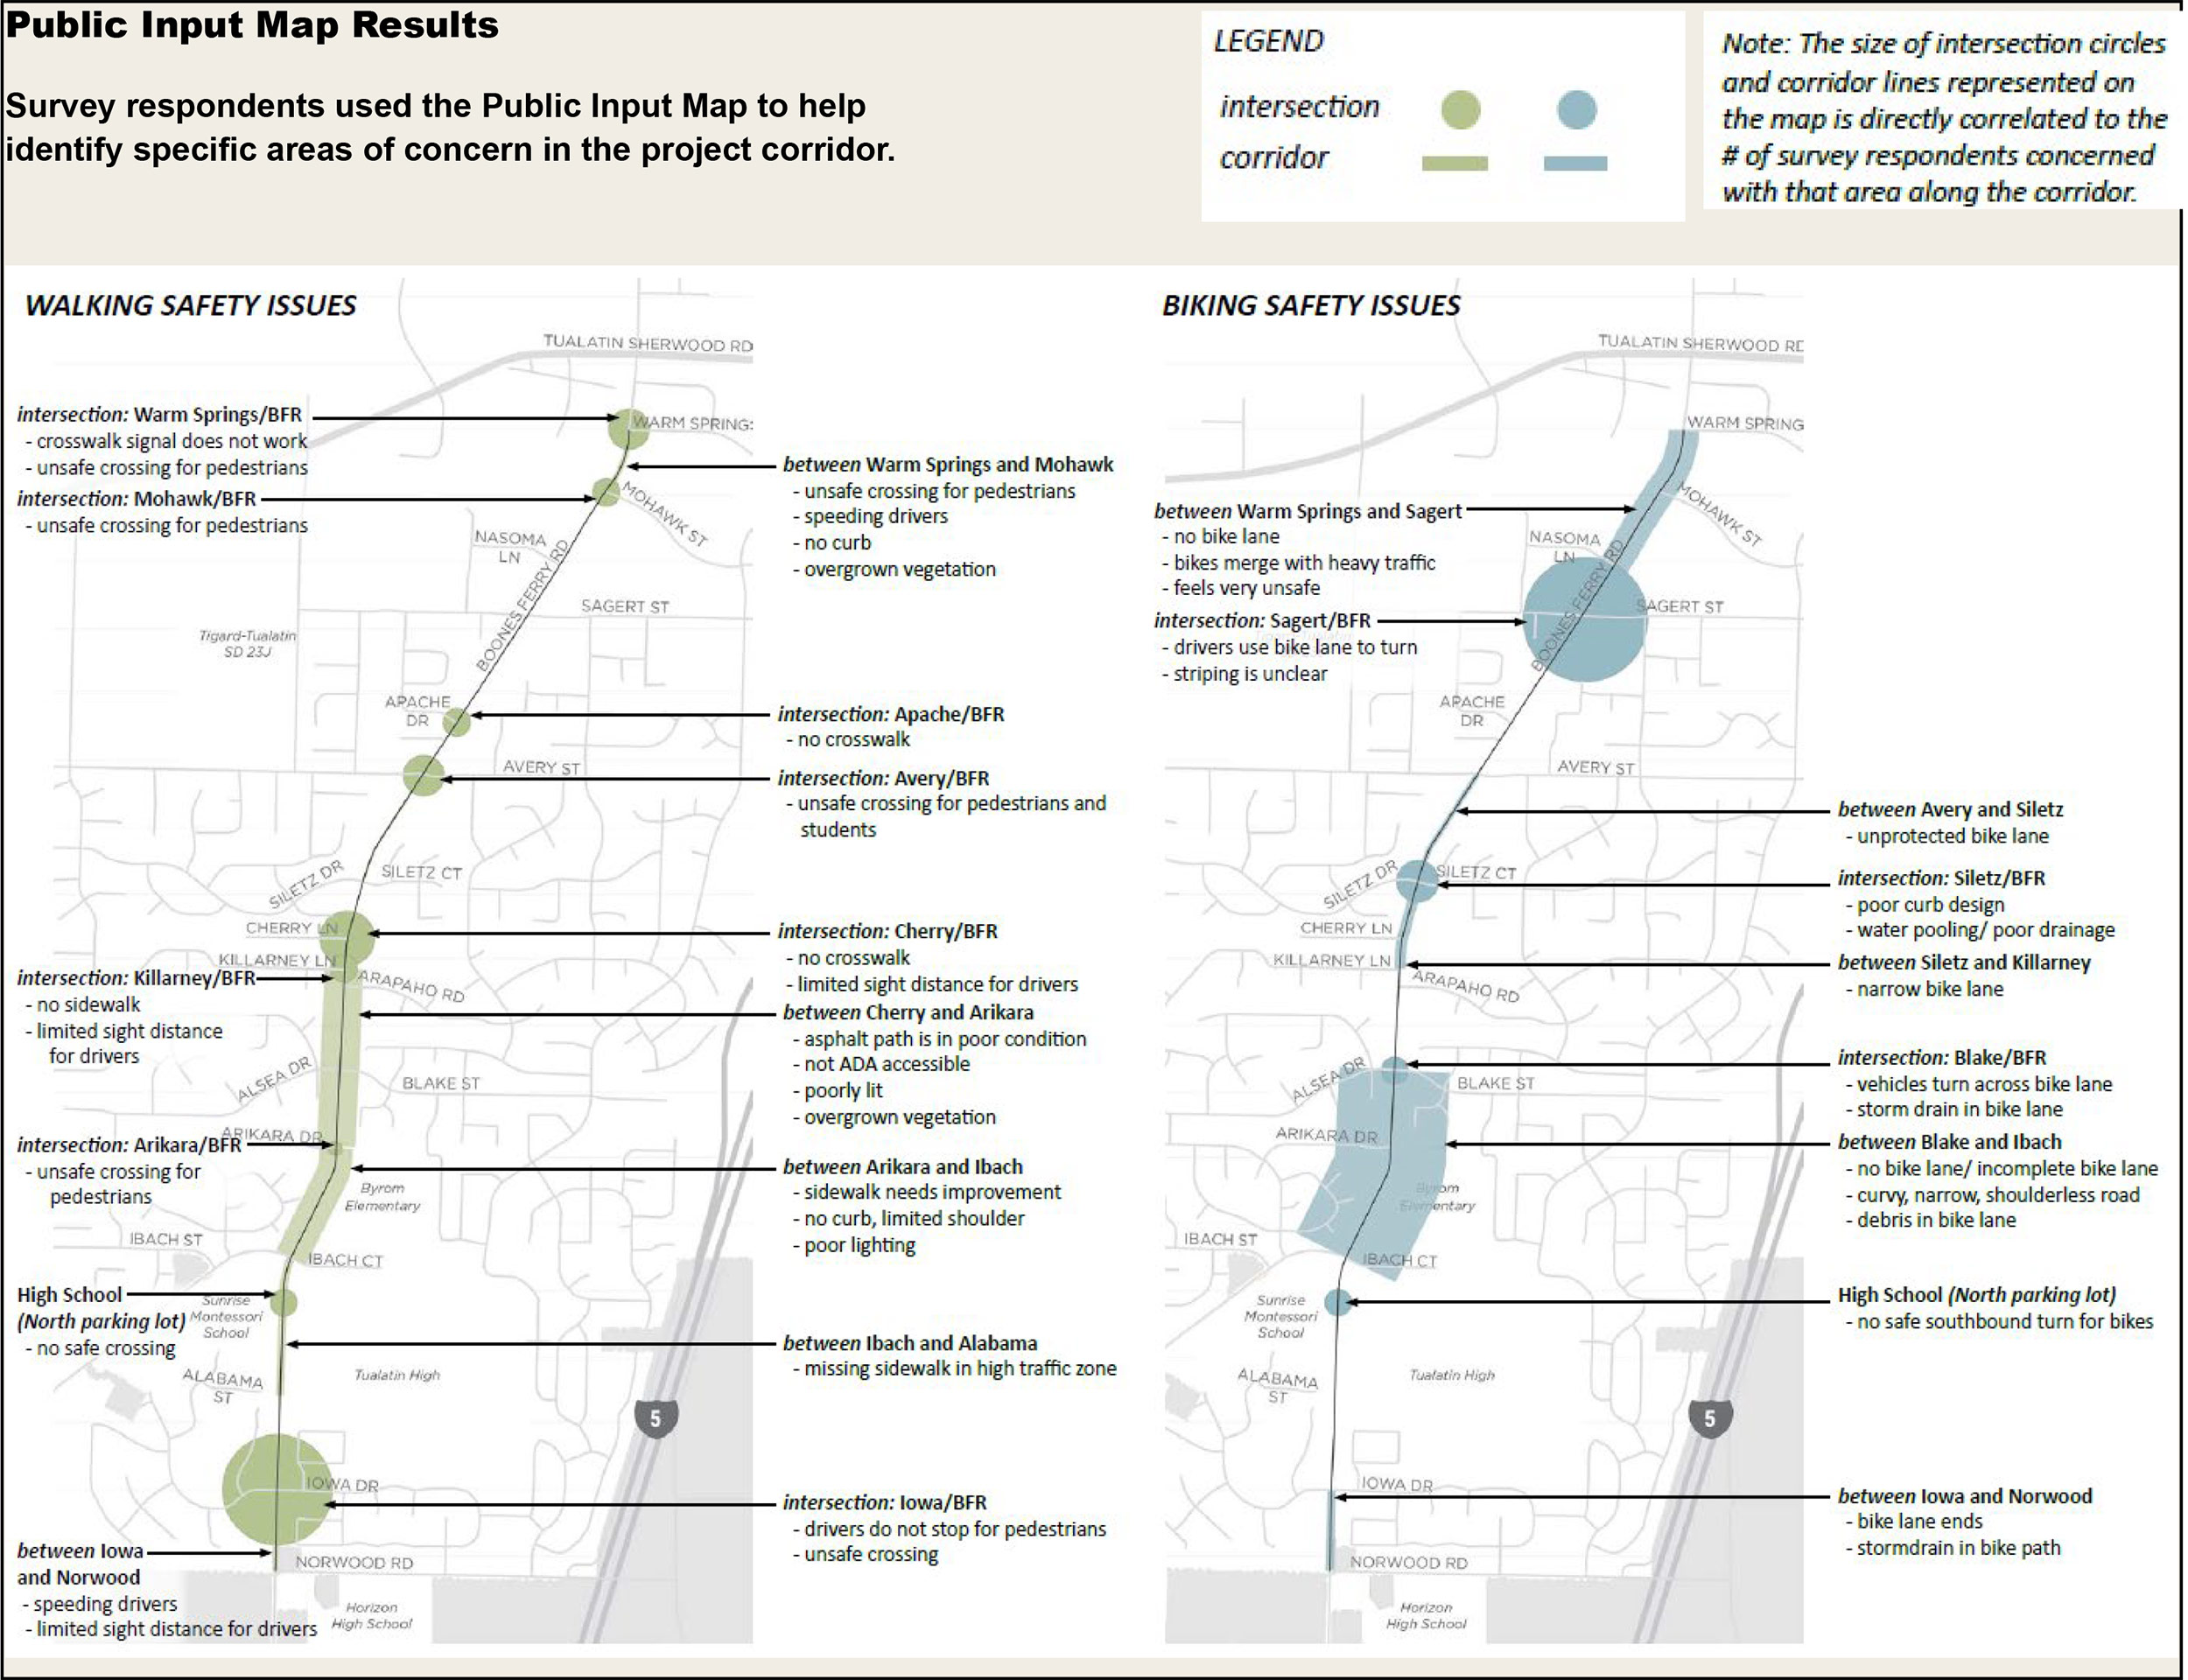 BFRCorridor-Public Input Map Results